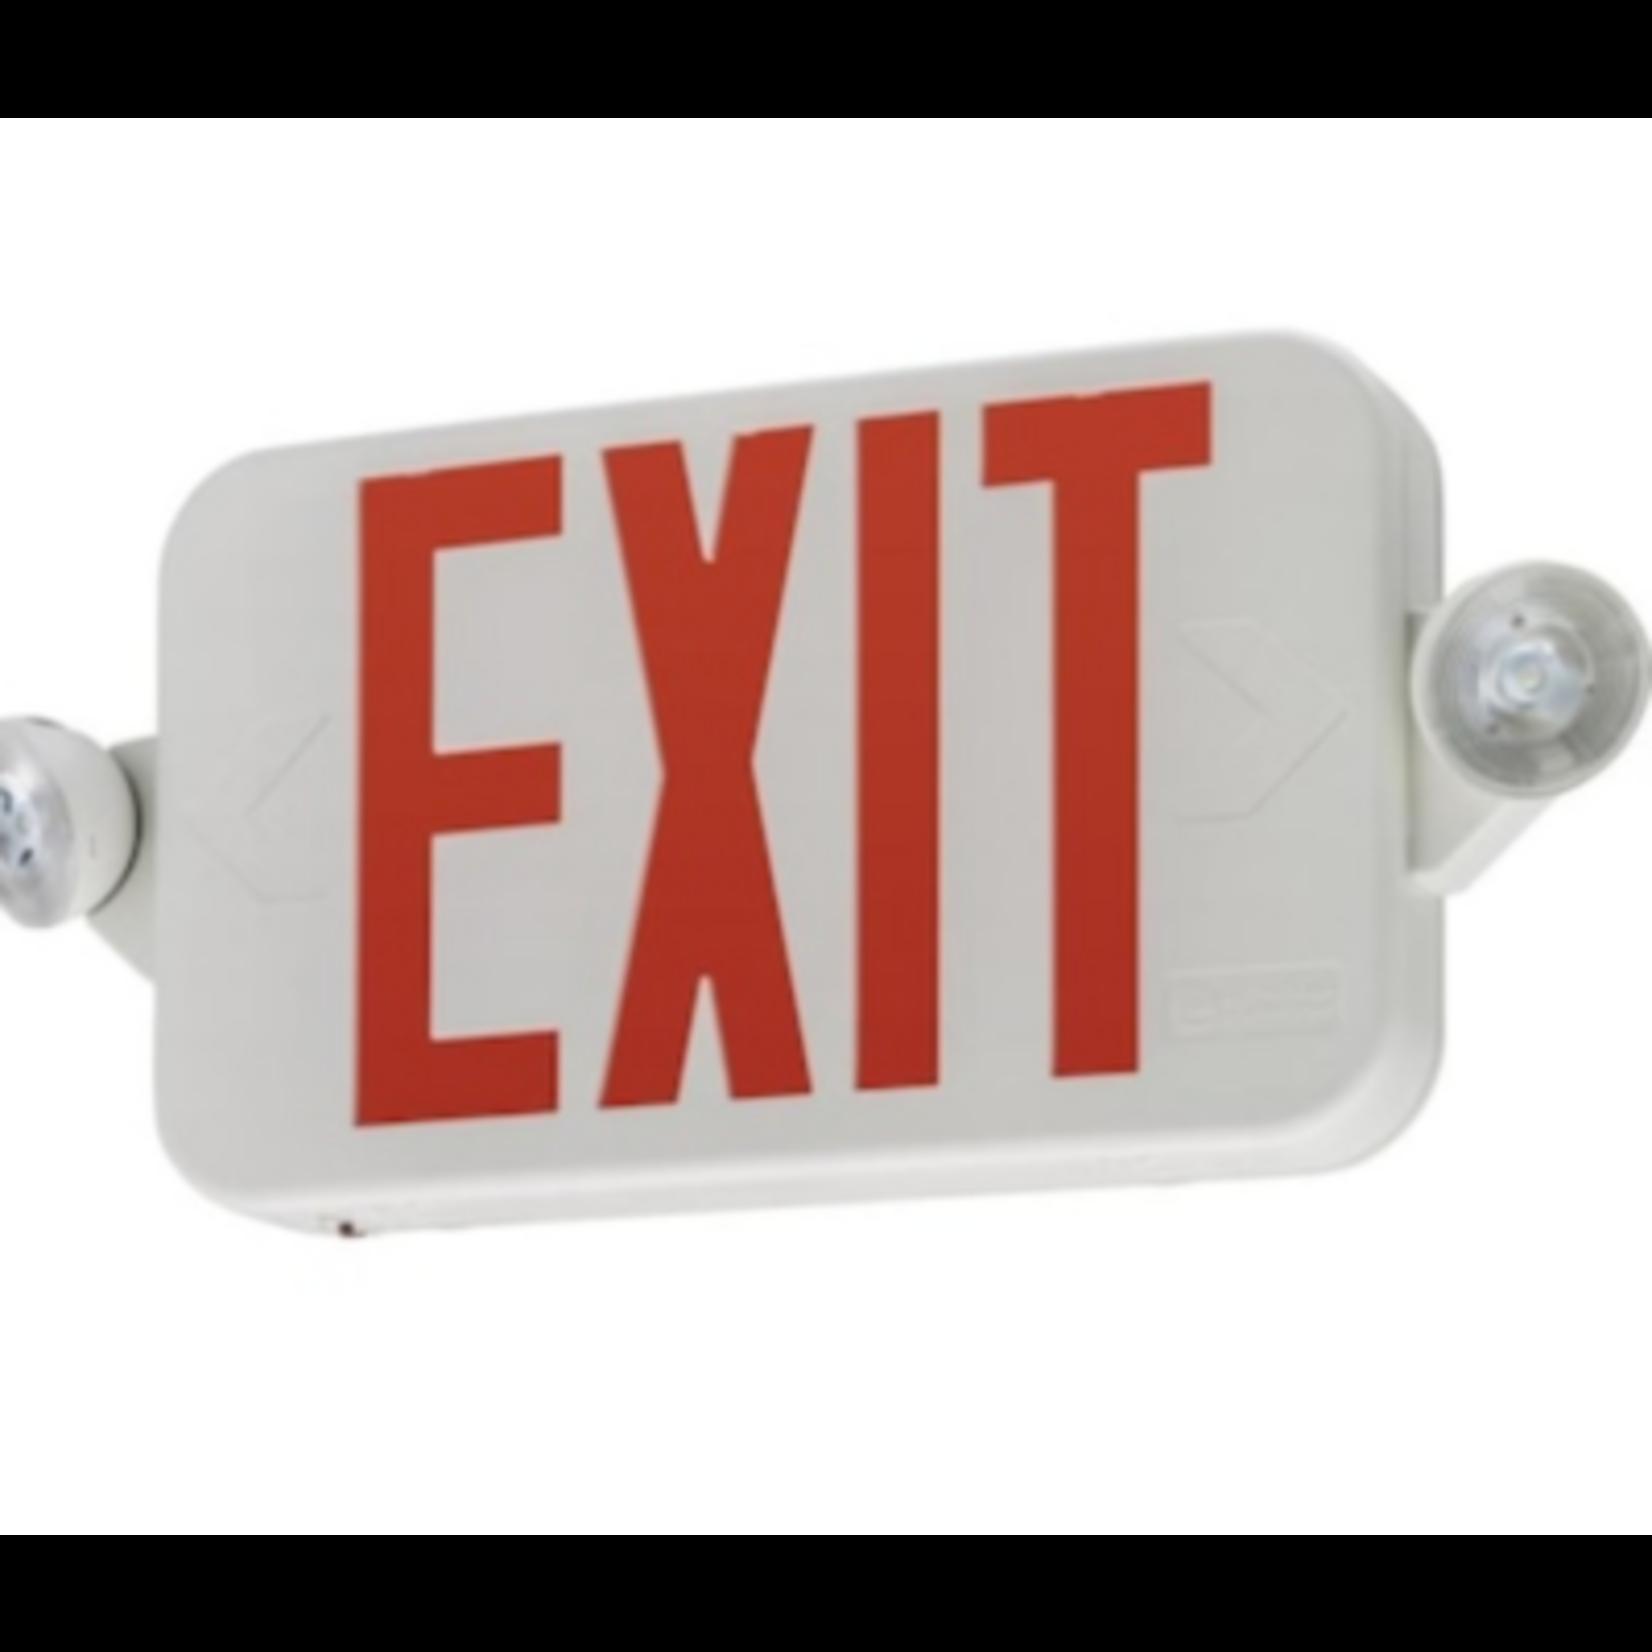 6446 Lithonia Lighting Red LED Exit Light